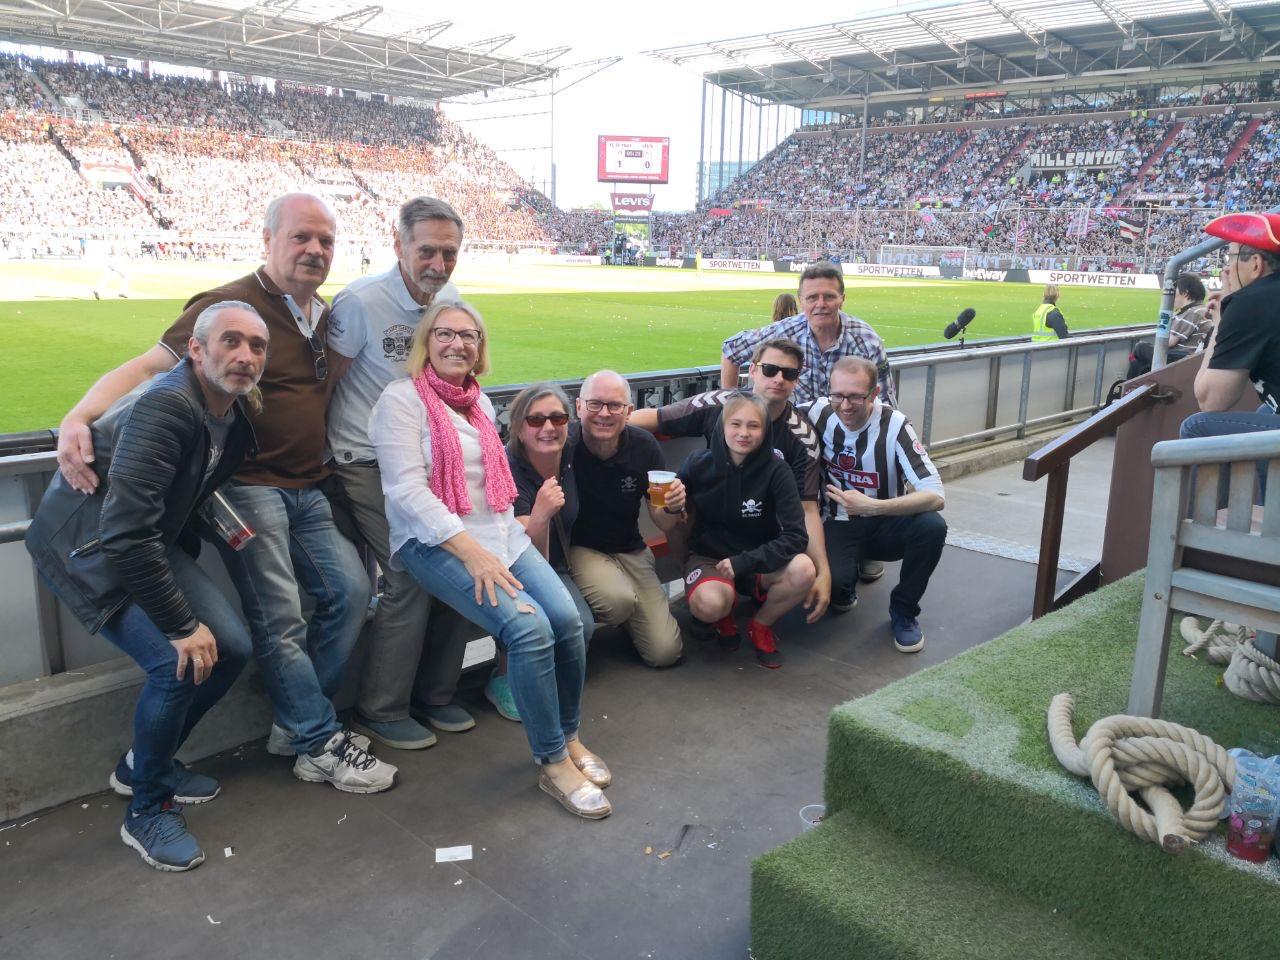 Eduard, Thomas M., Wolfgang, Margred, Sabine, Torsten, Diana, Olaf, Paul und Tilo